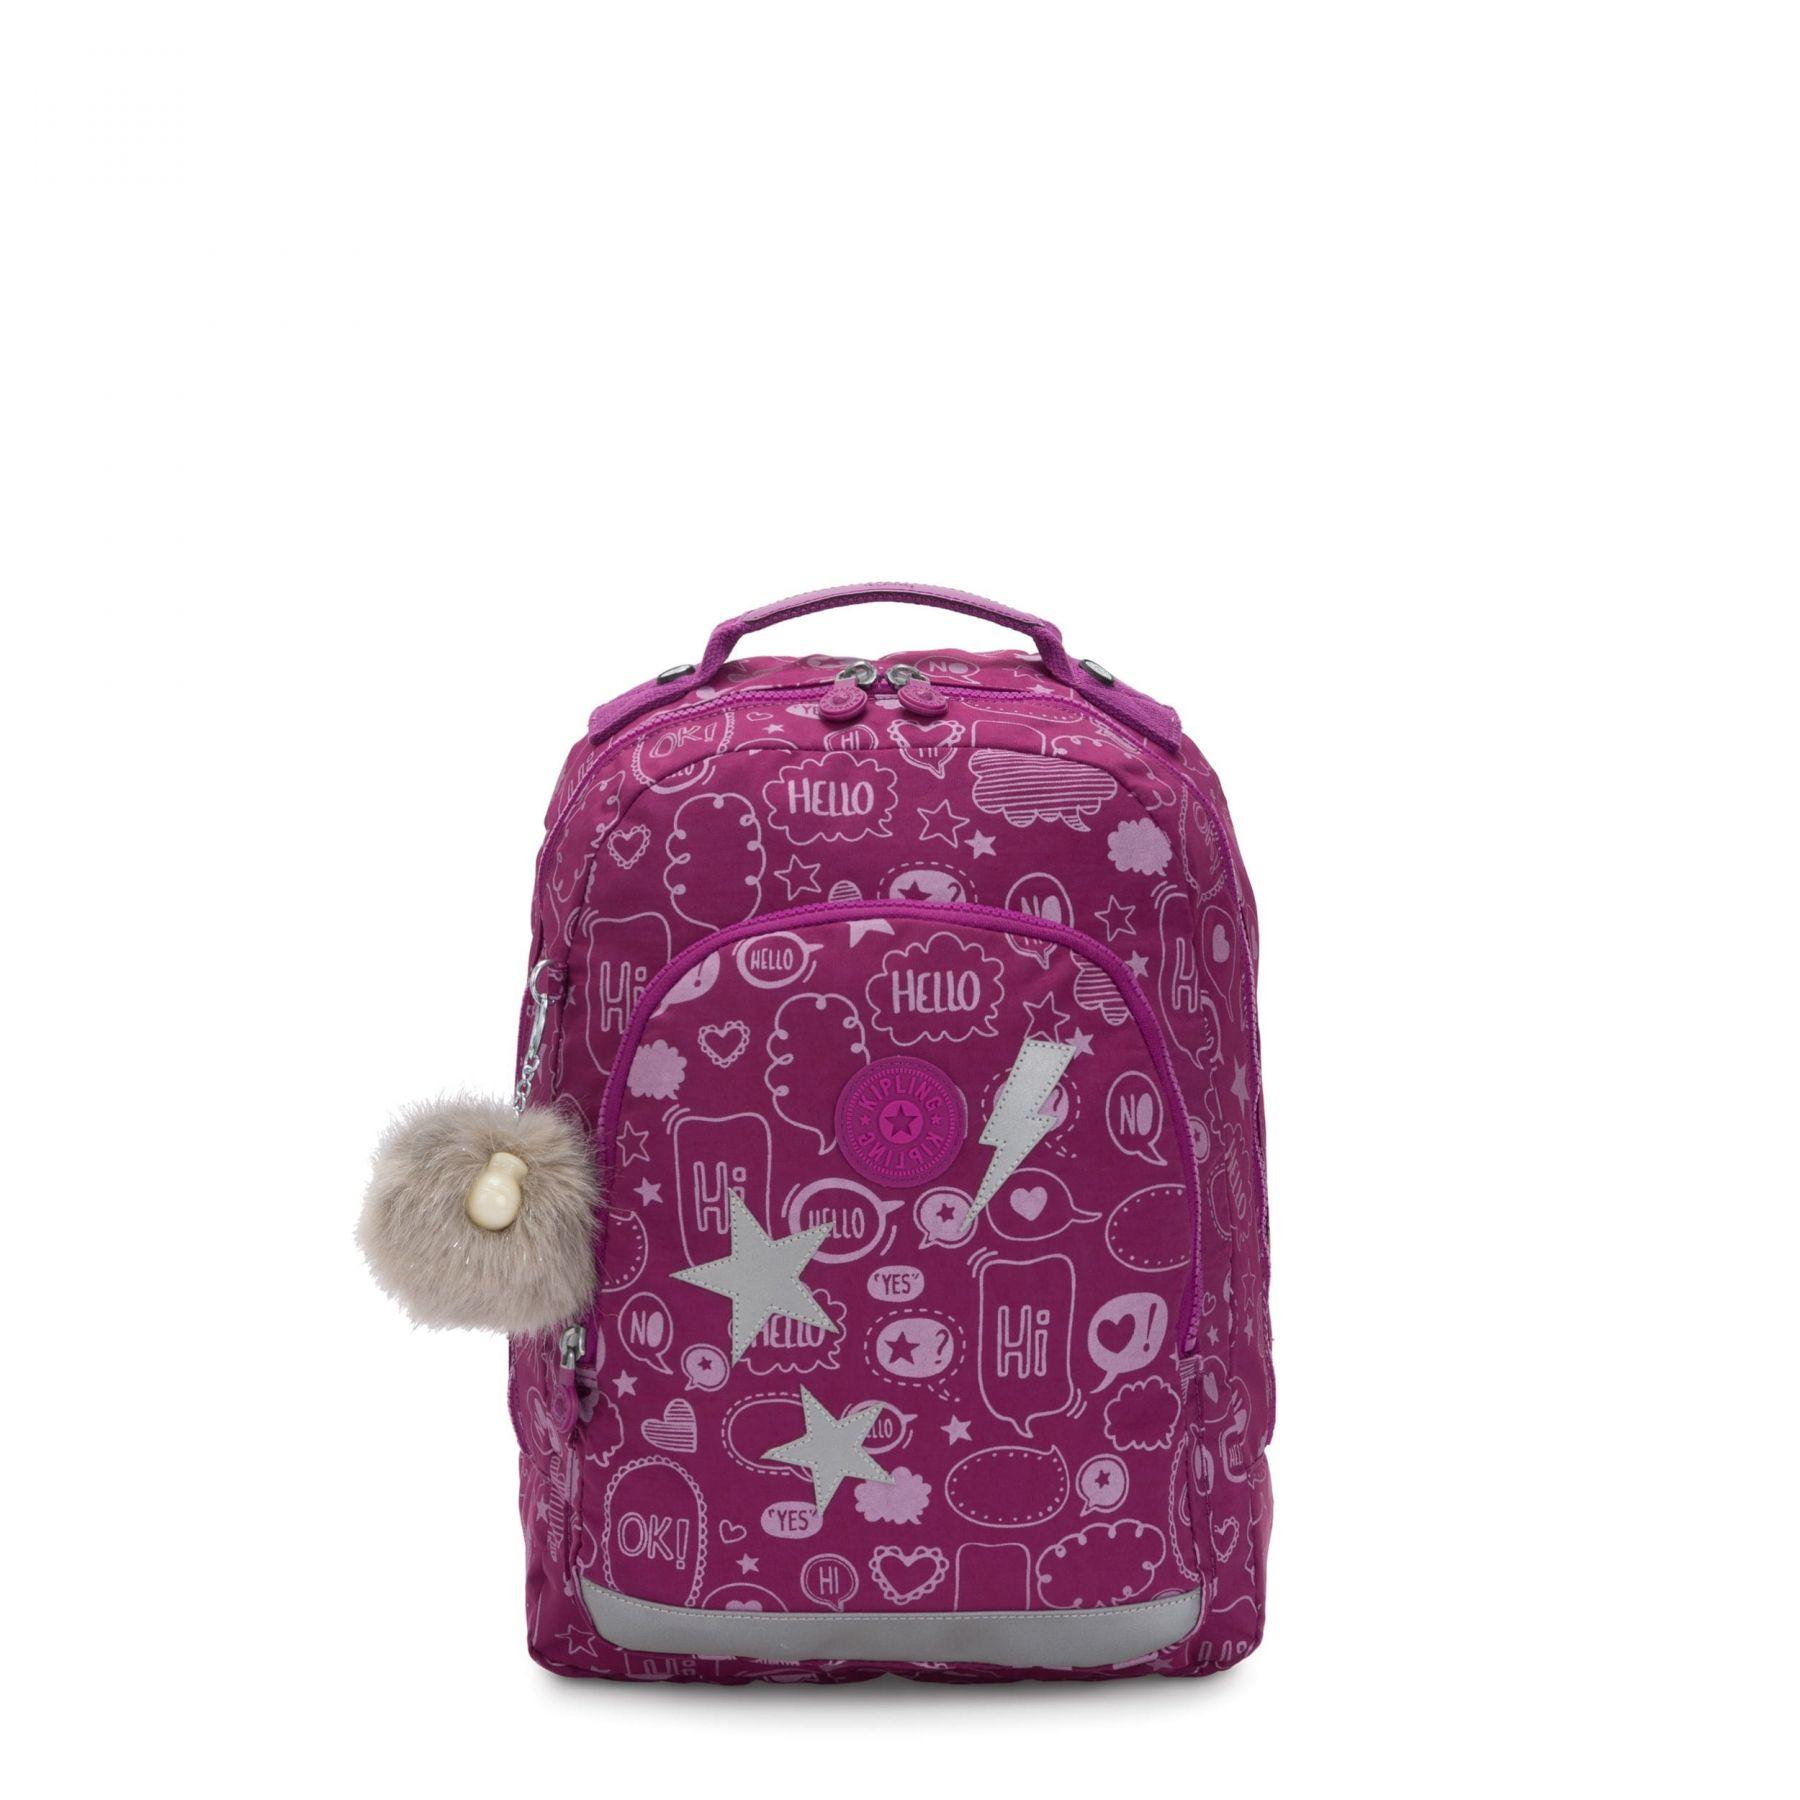 CLASS ROOM S PATCH SCHOOL BAGS by Kipling